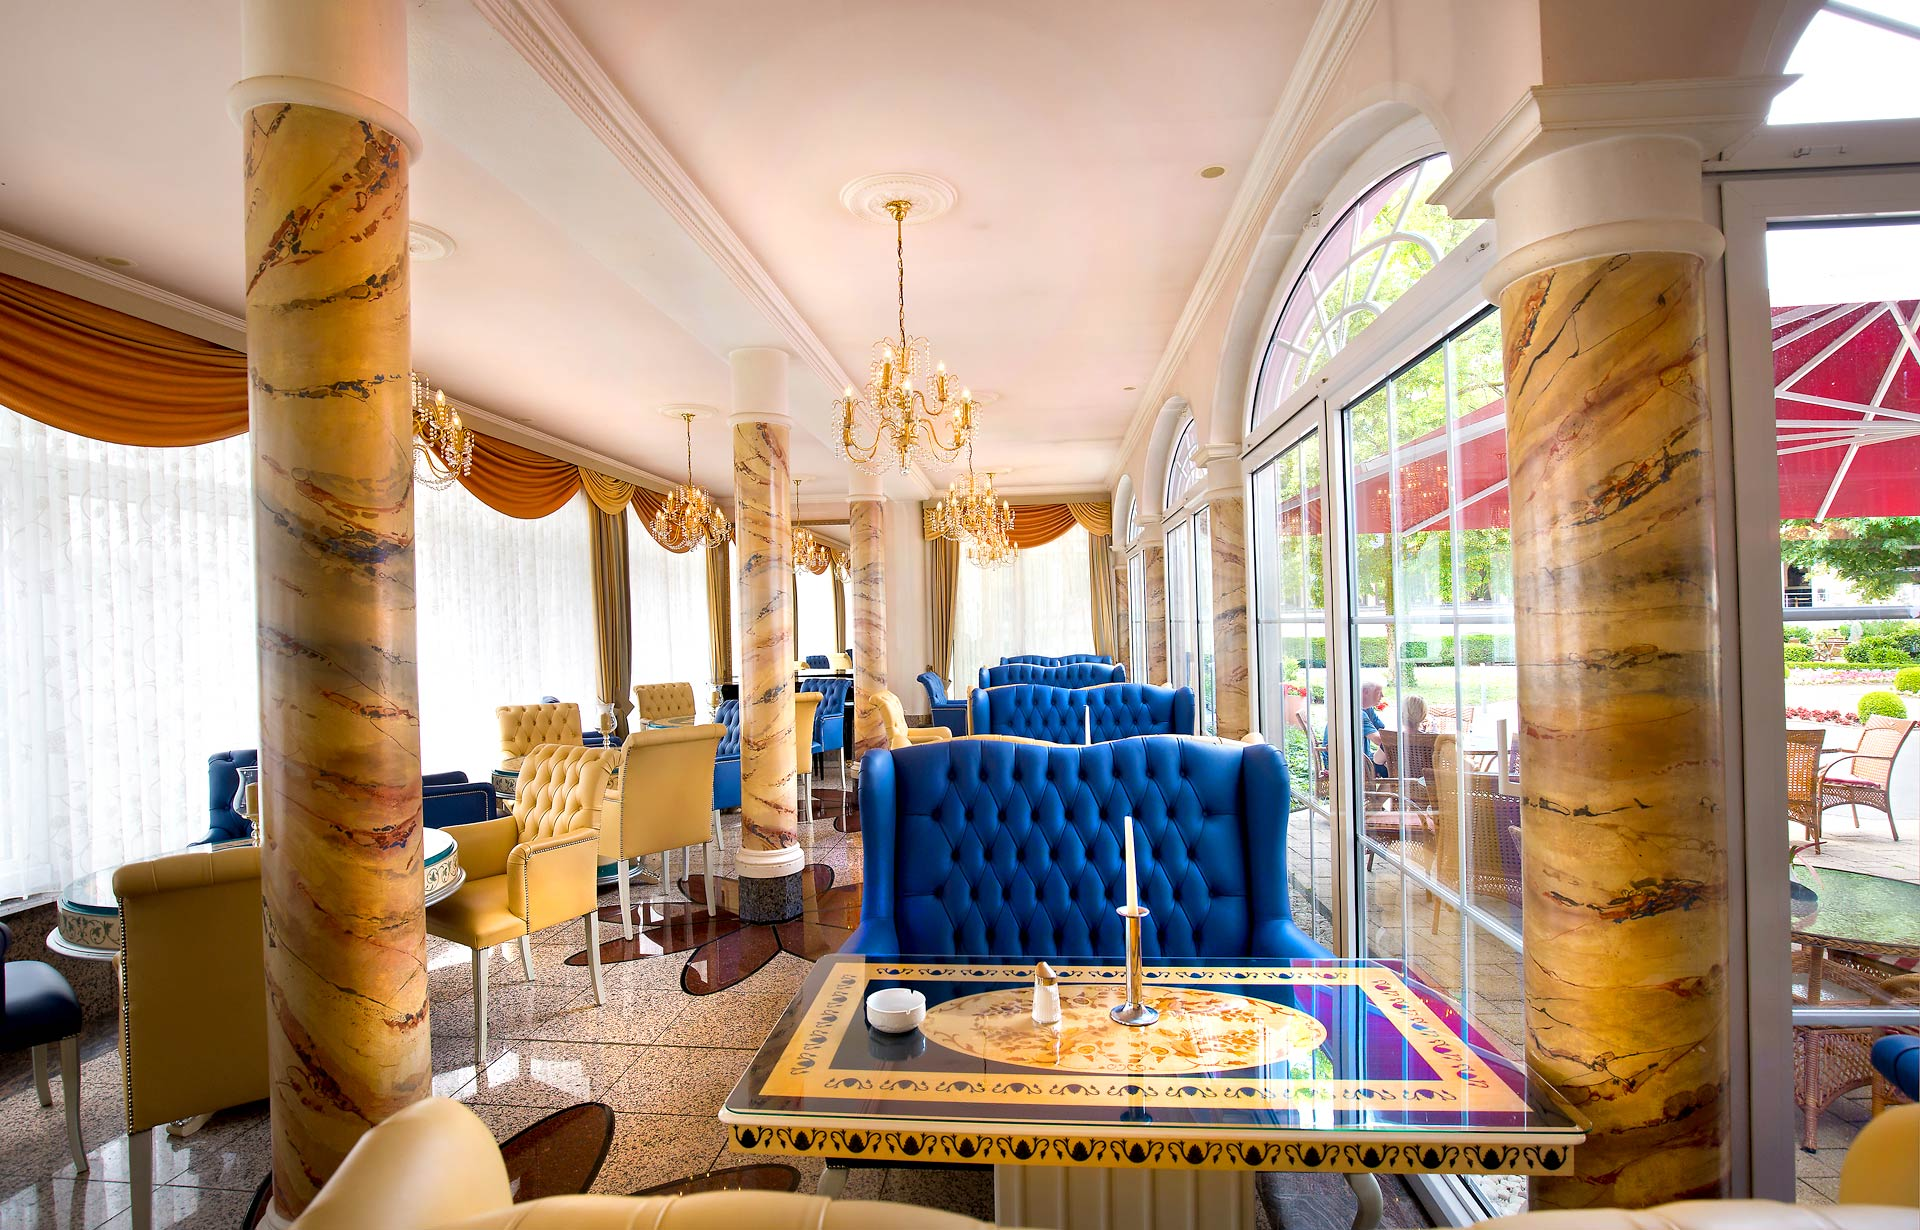 Hotel Furstenhof Bad Bertrich Arrangements